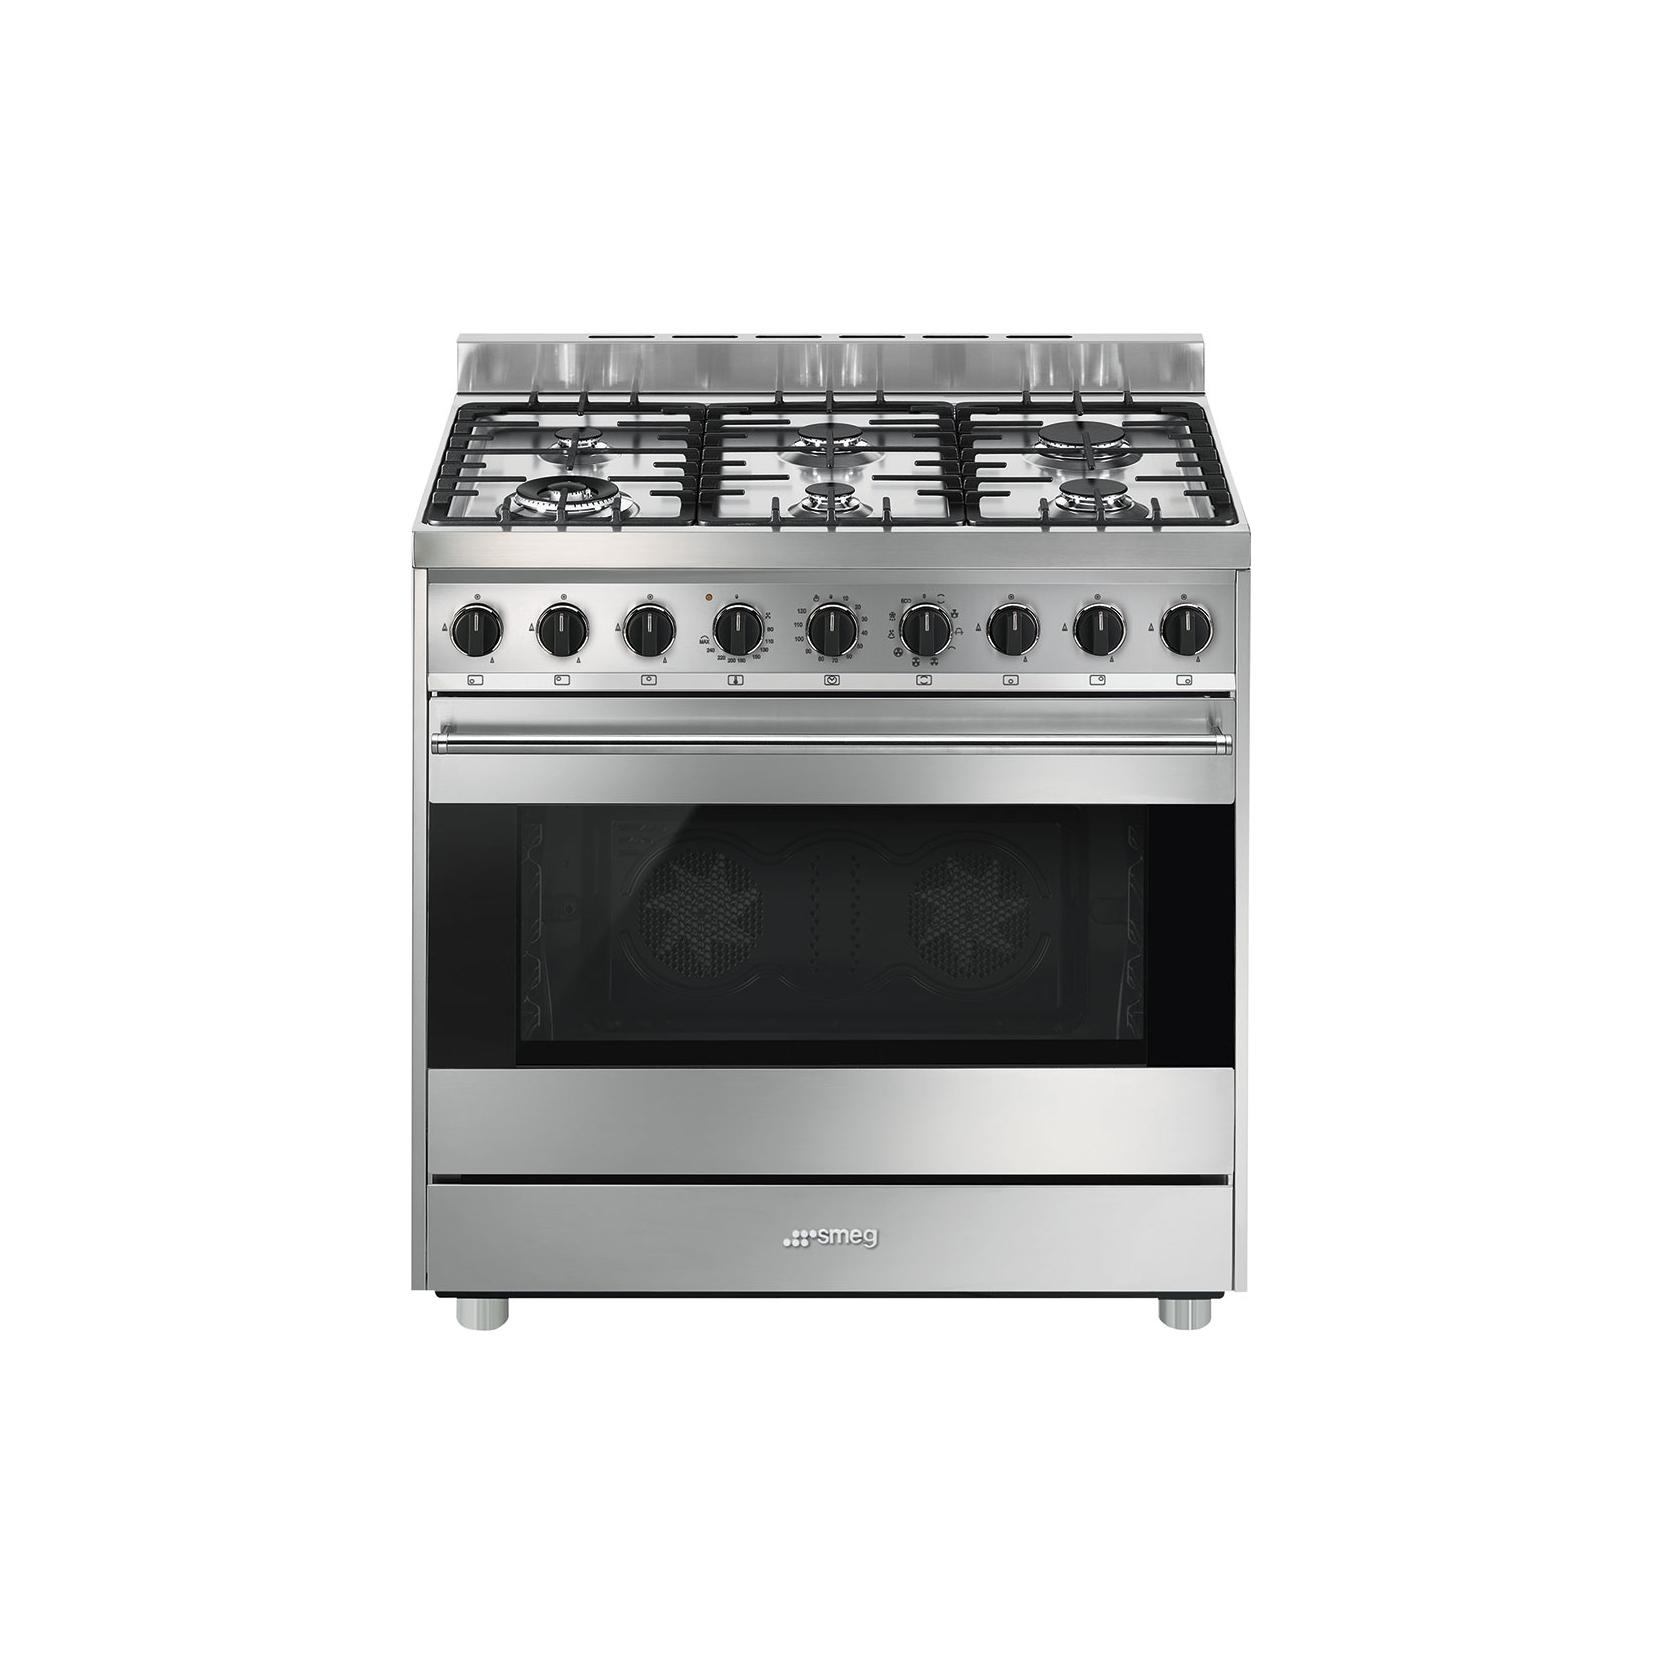 Smeg b9gmxi9 cucina a gas forno elettrico multifunzione 90x60 cm inox garanzia italia - Cucina a gas smeg ...